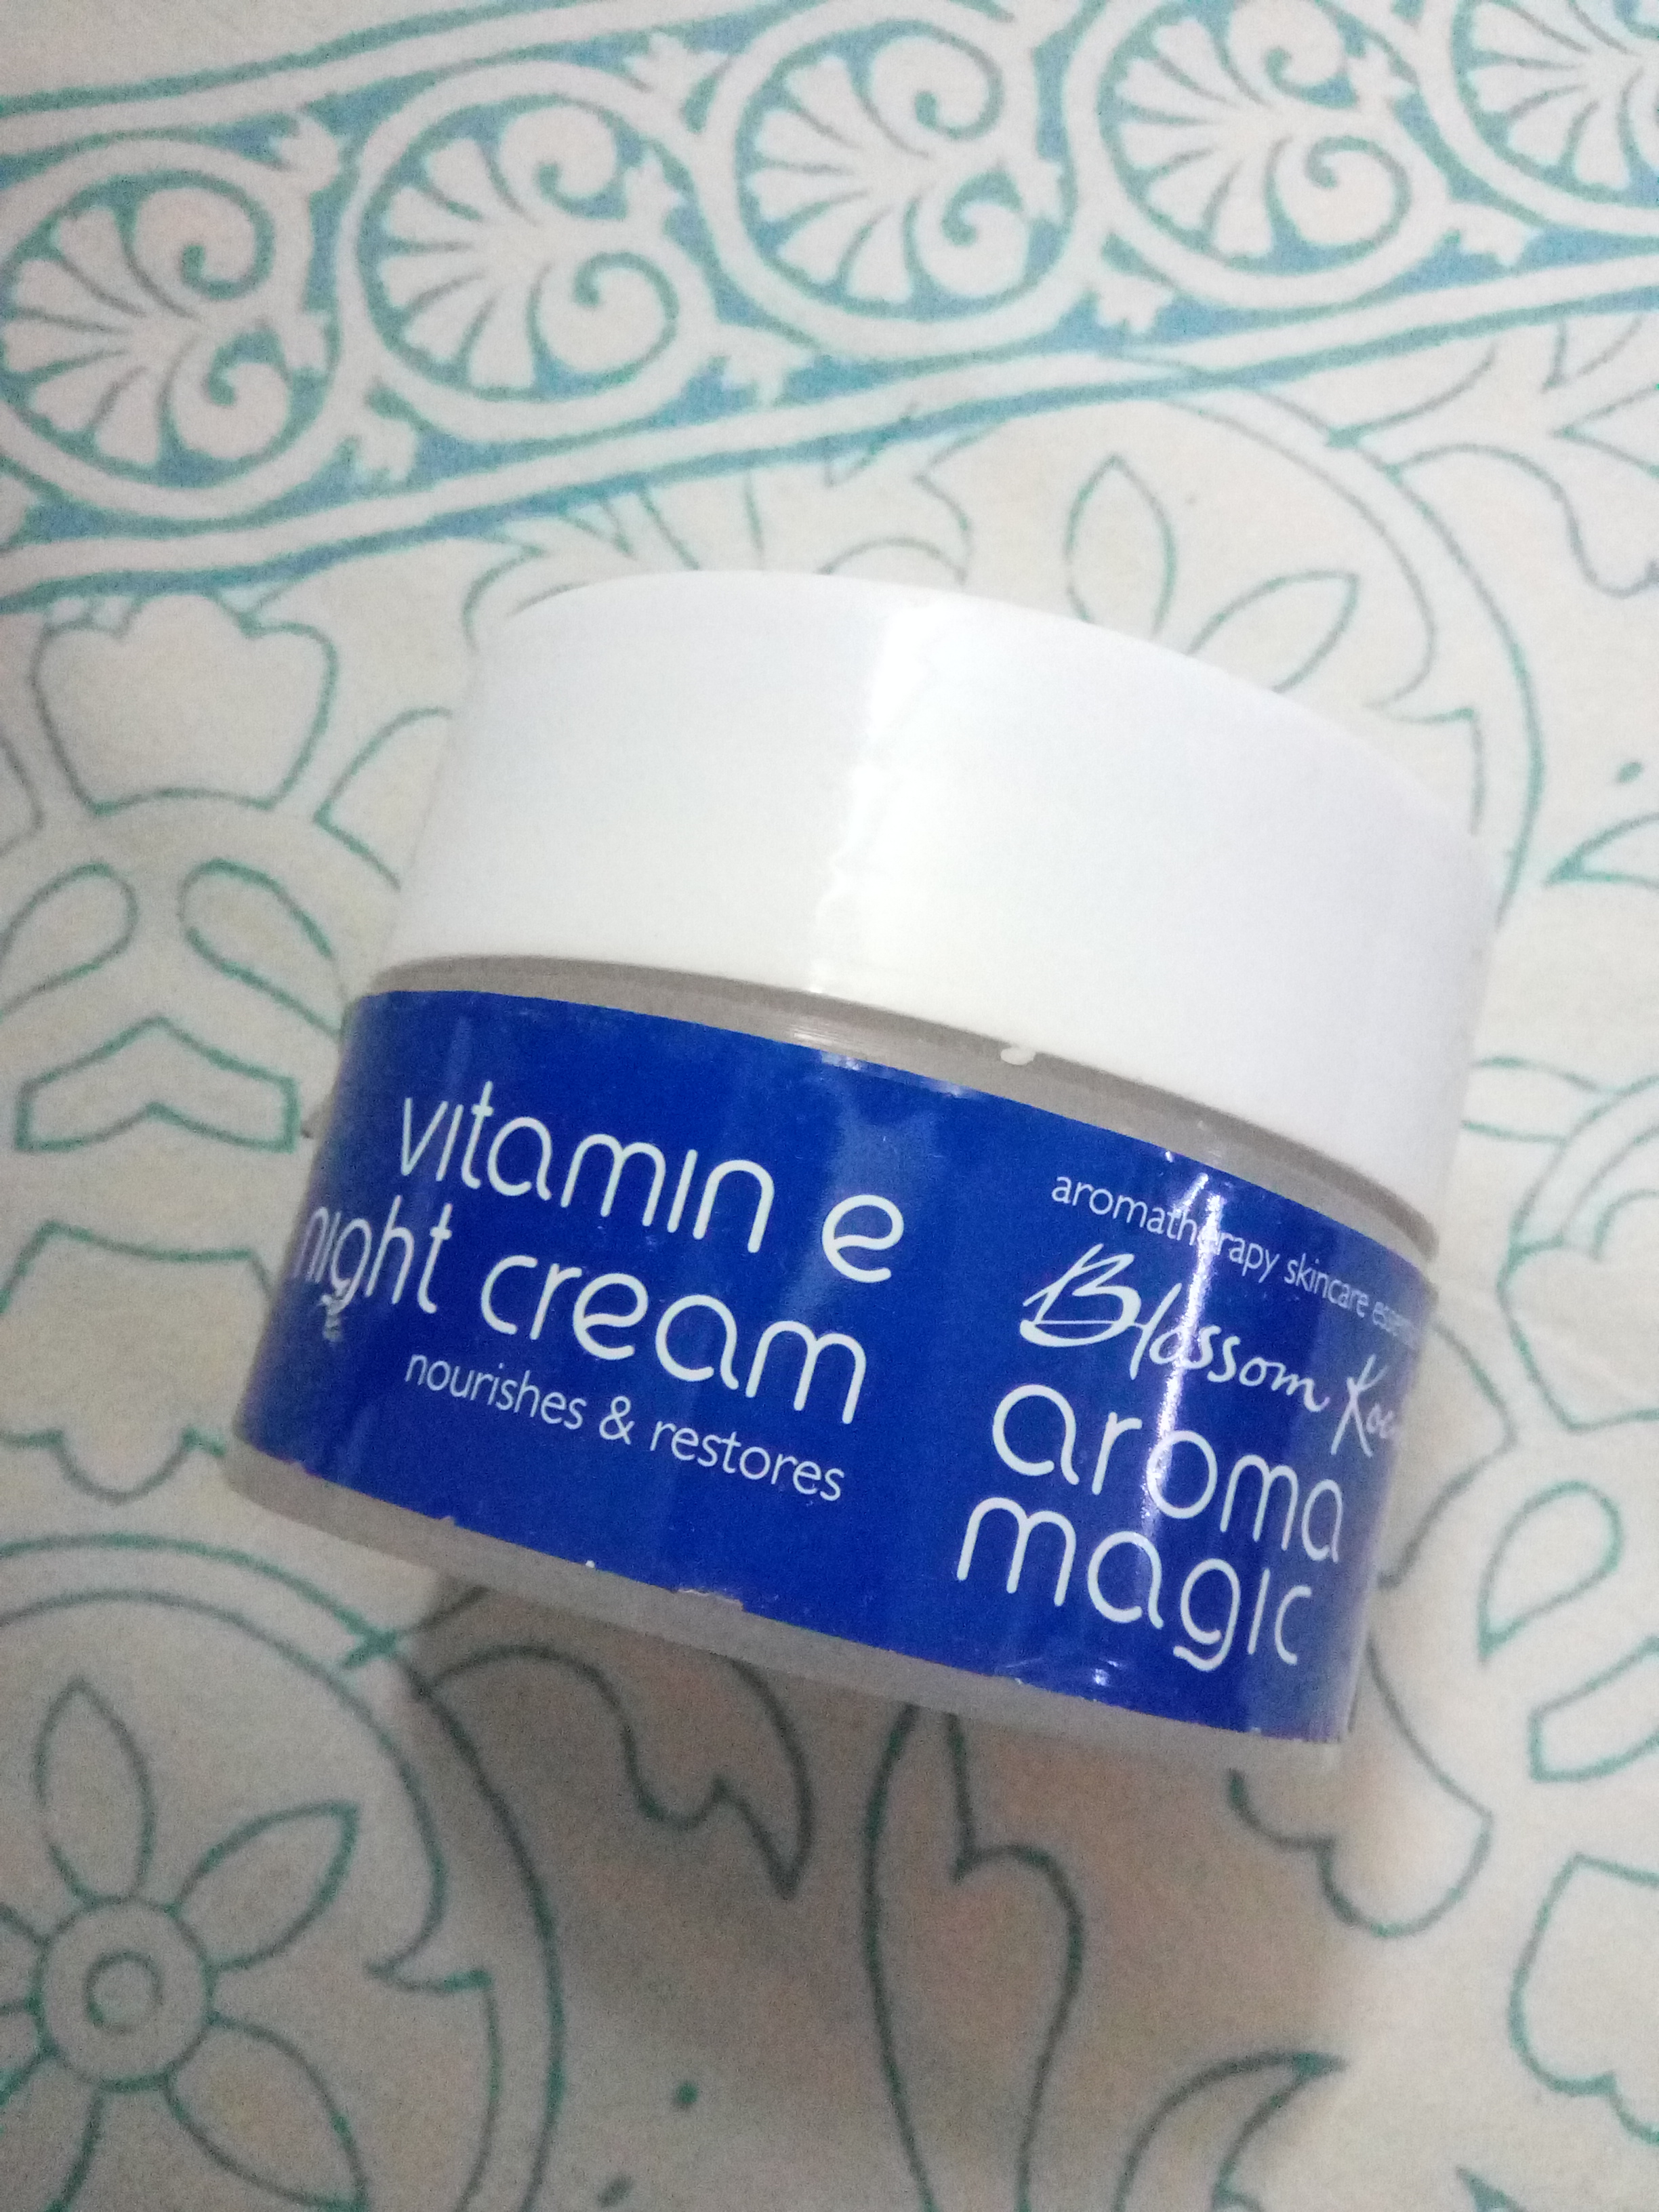 Aroma Magic Vitamin E Night Cream-Aroma Magic Vitamin E Night Cream-By aflyingsoul